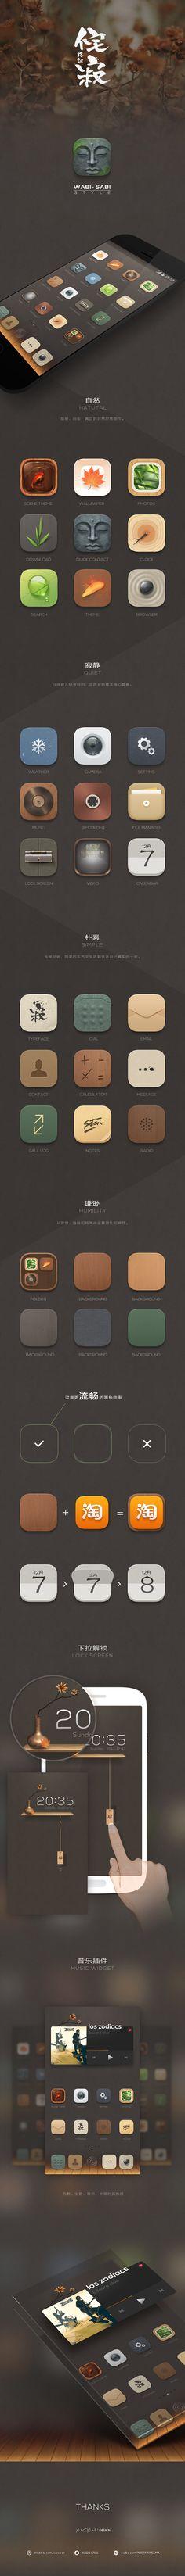 Wabi-sabi 侘寂格调- by: xiaoxian1985 - ICONFANS专业界面设计平台